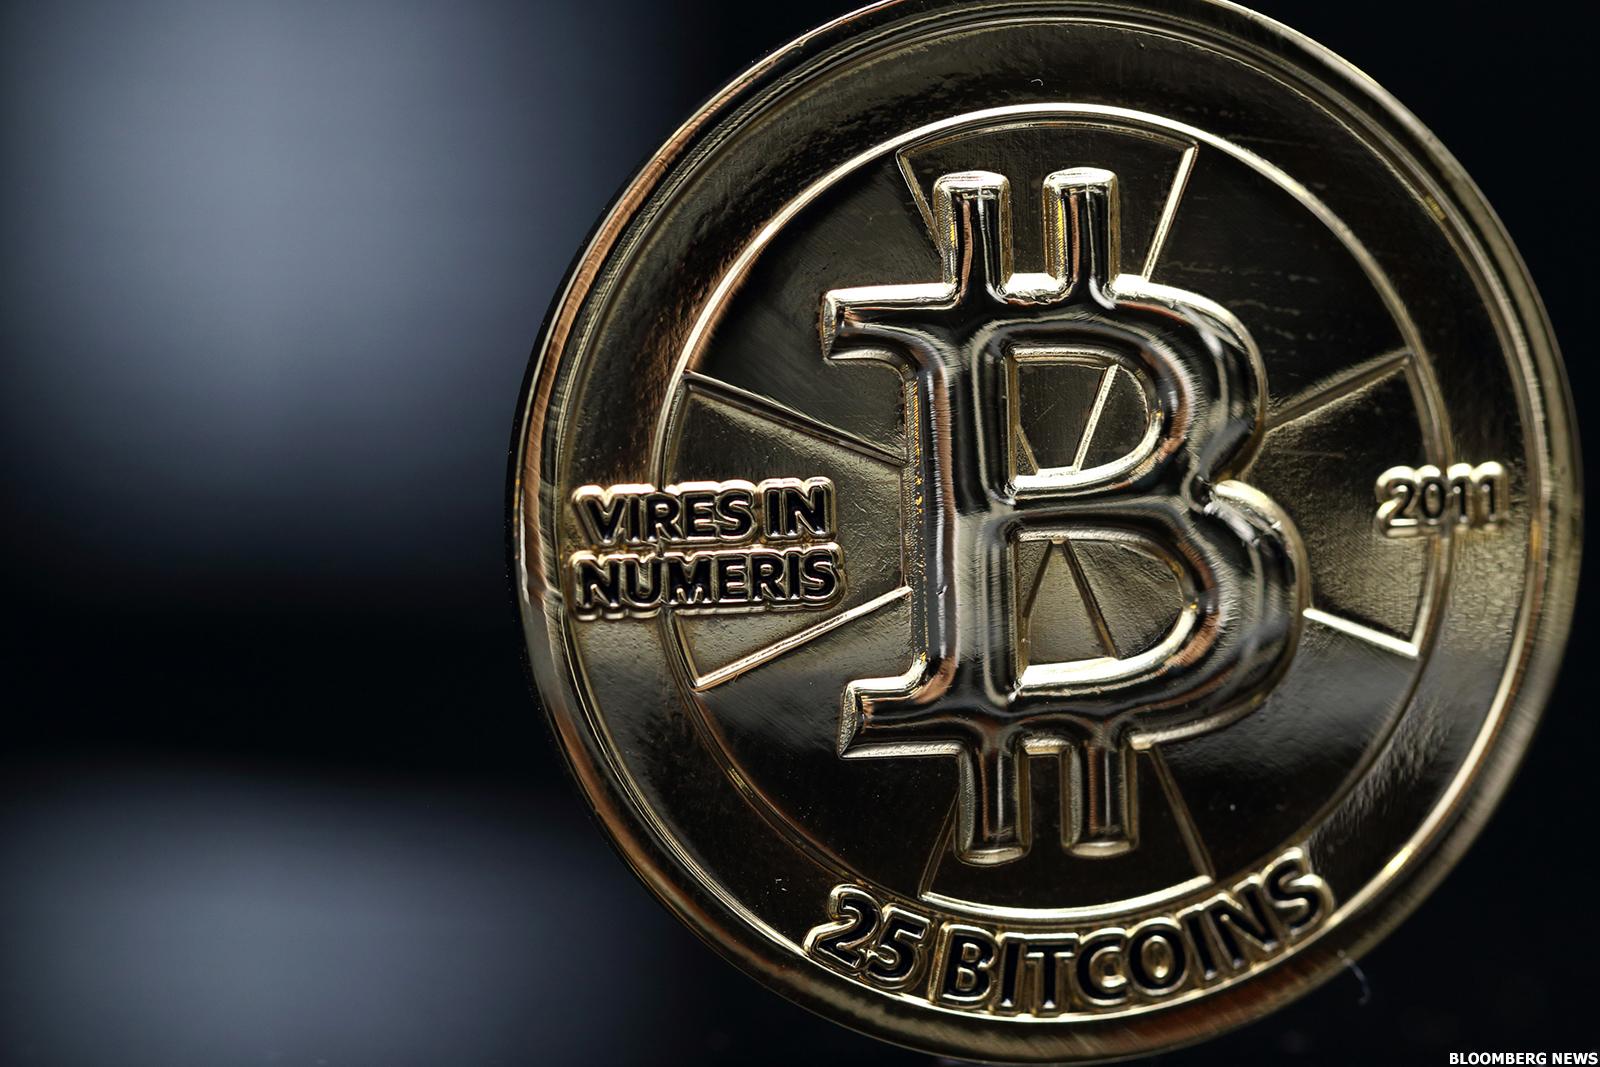 Bitcoin Isn't Viable: Morgan Stanley - TheStreet